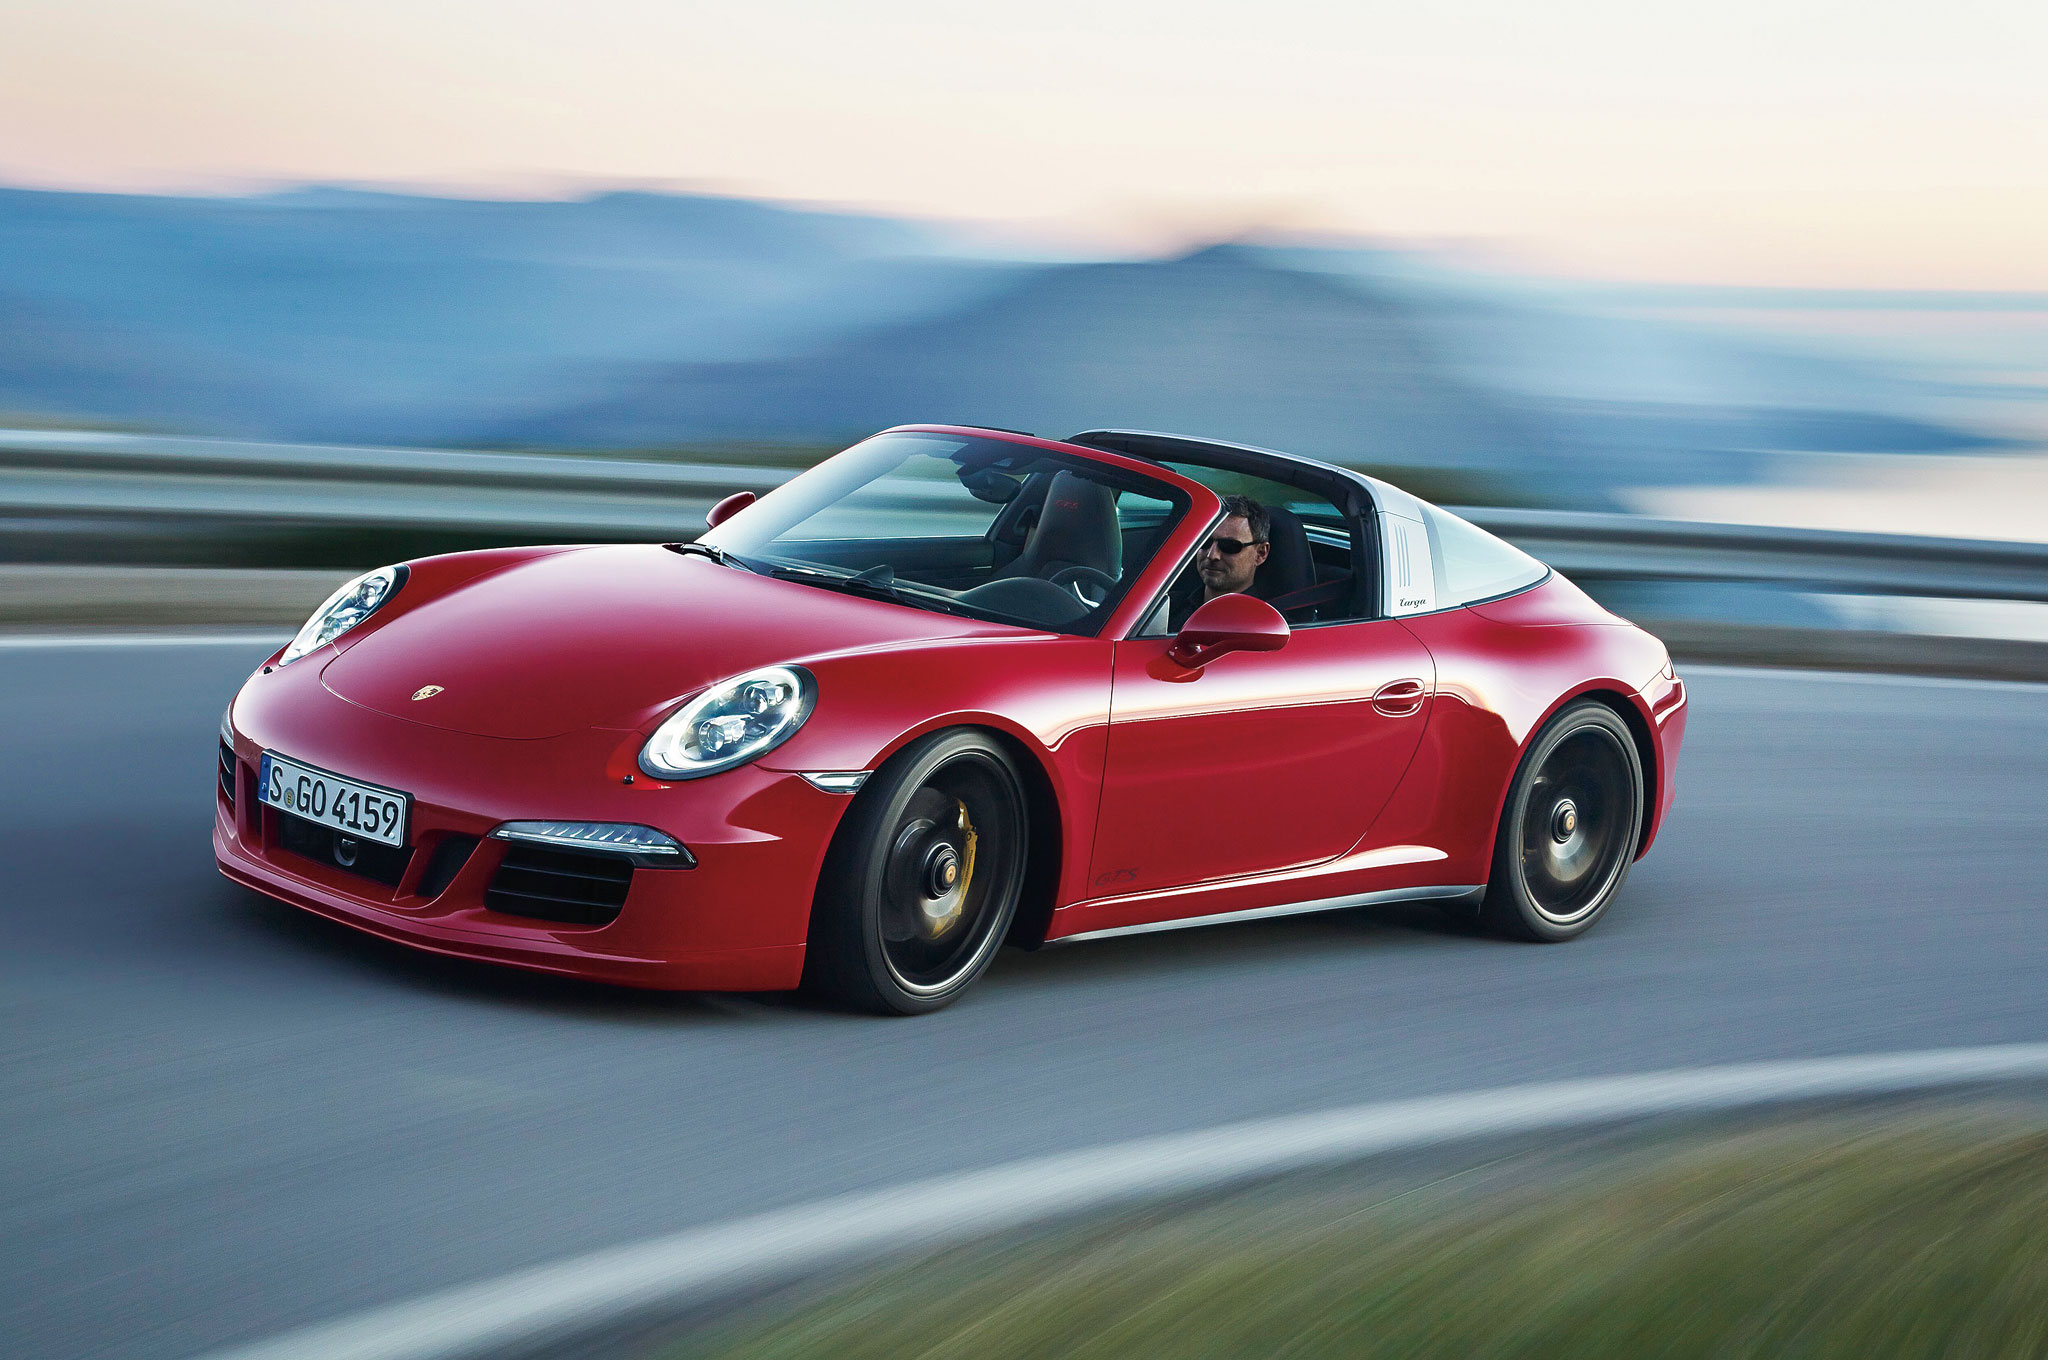 2016 Porsche 911 Targa 4 GTS Front Three Quarter In Motion2